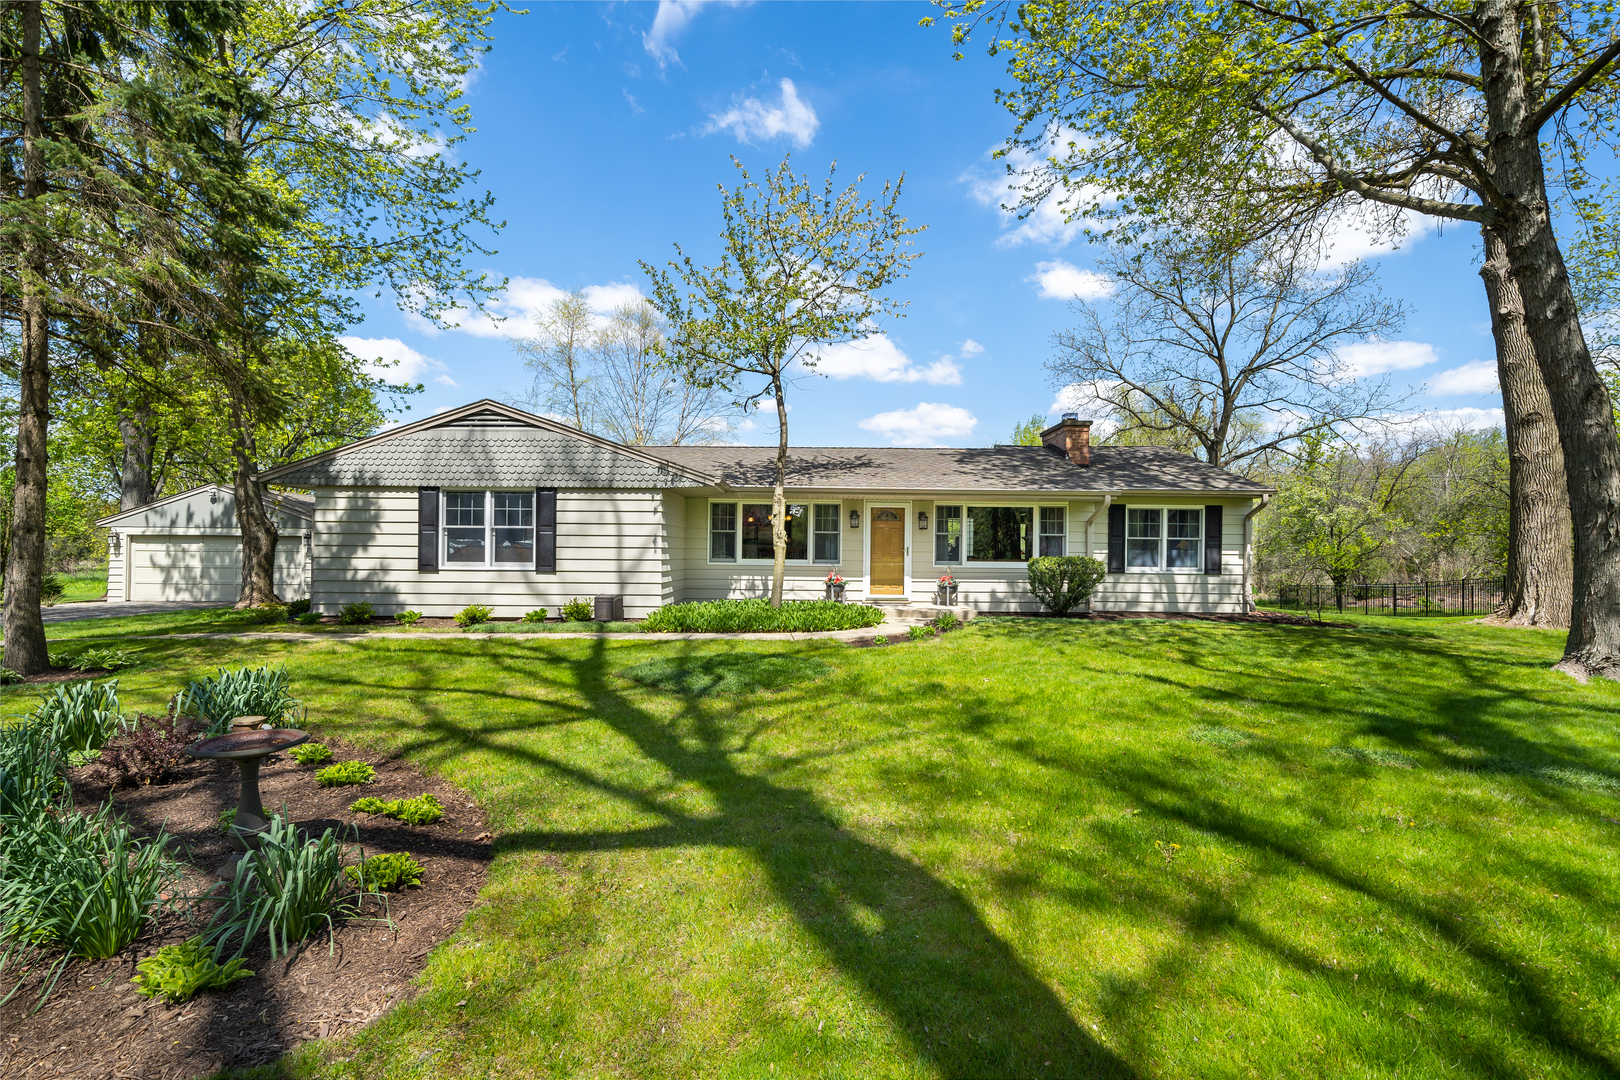 43w640 Thornapple Tree ,Sugar Grove, Illinois 60554